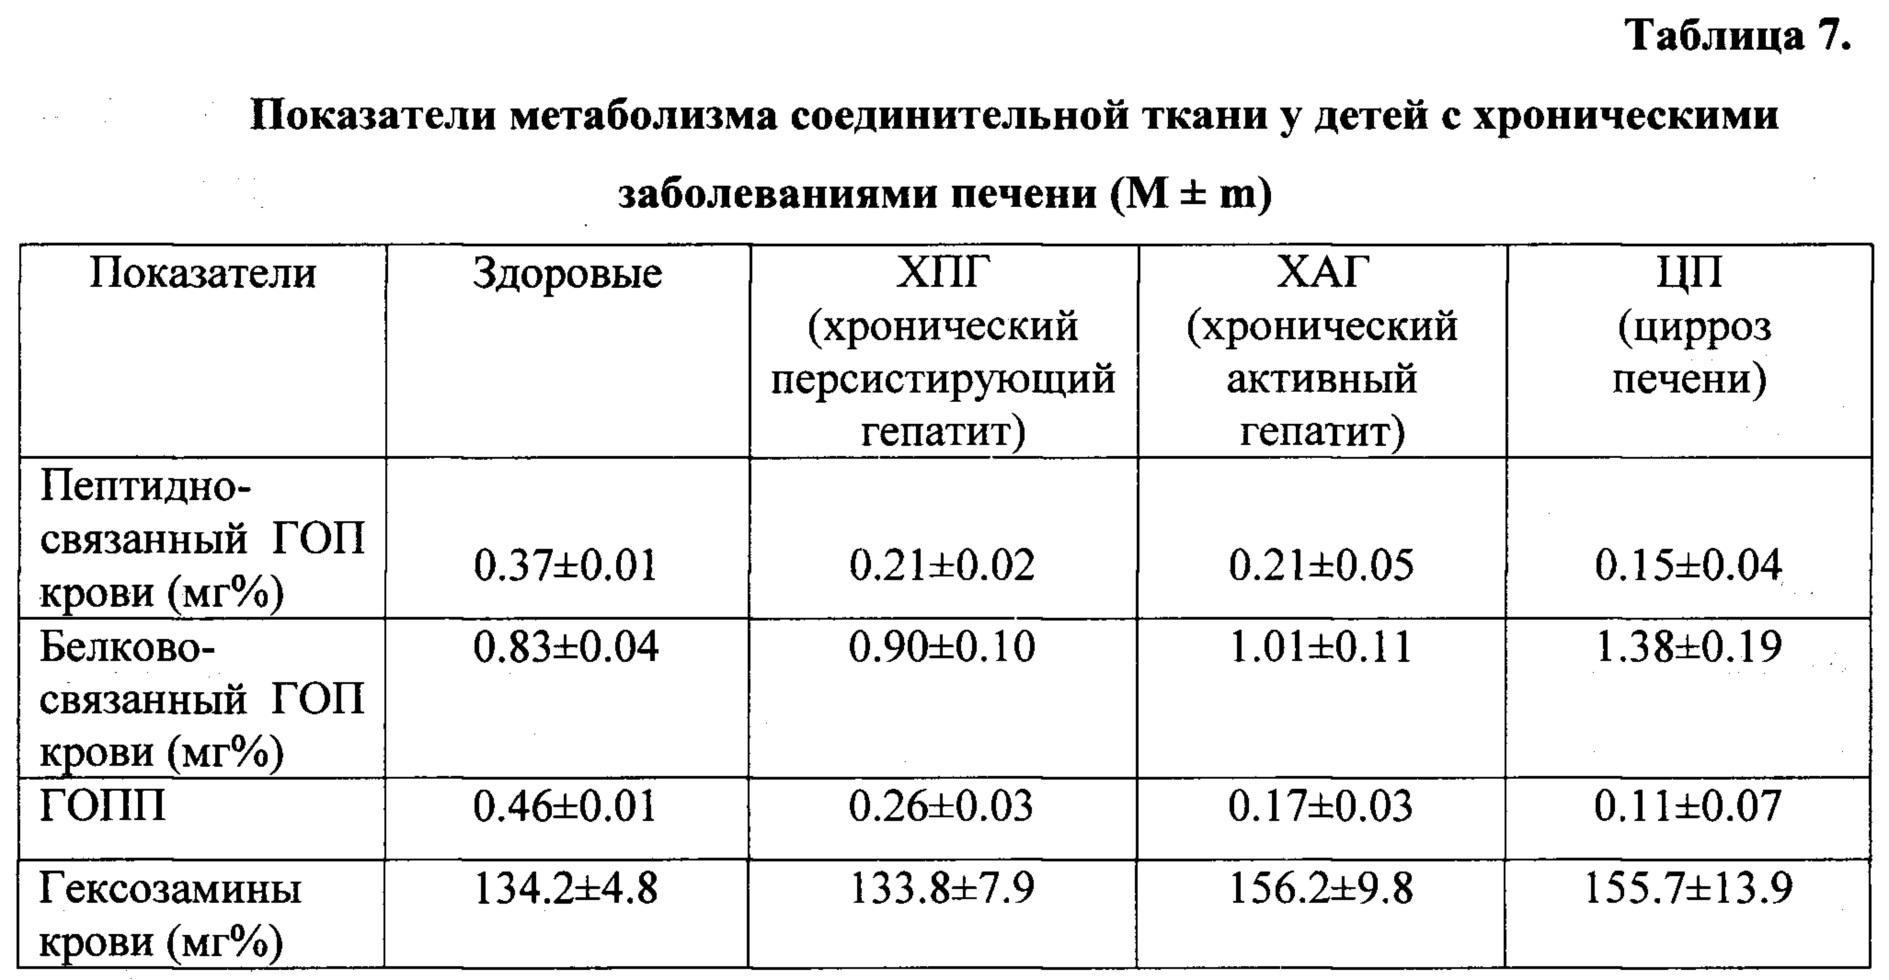 Анализы крови при циррозе печени расшифровка